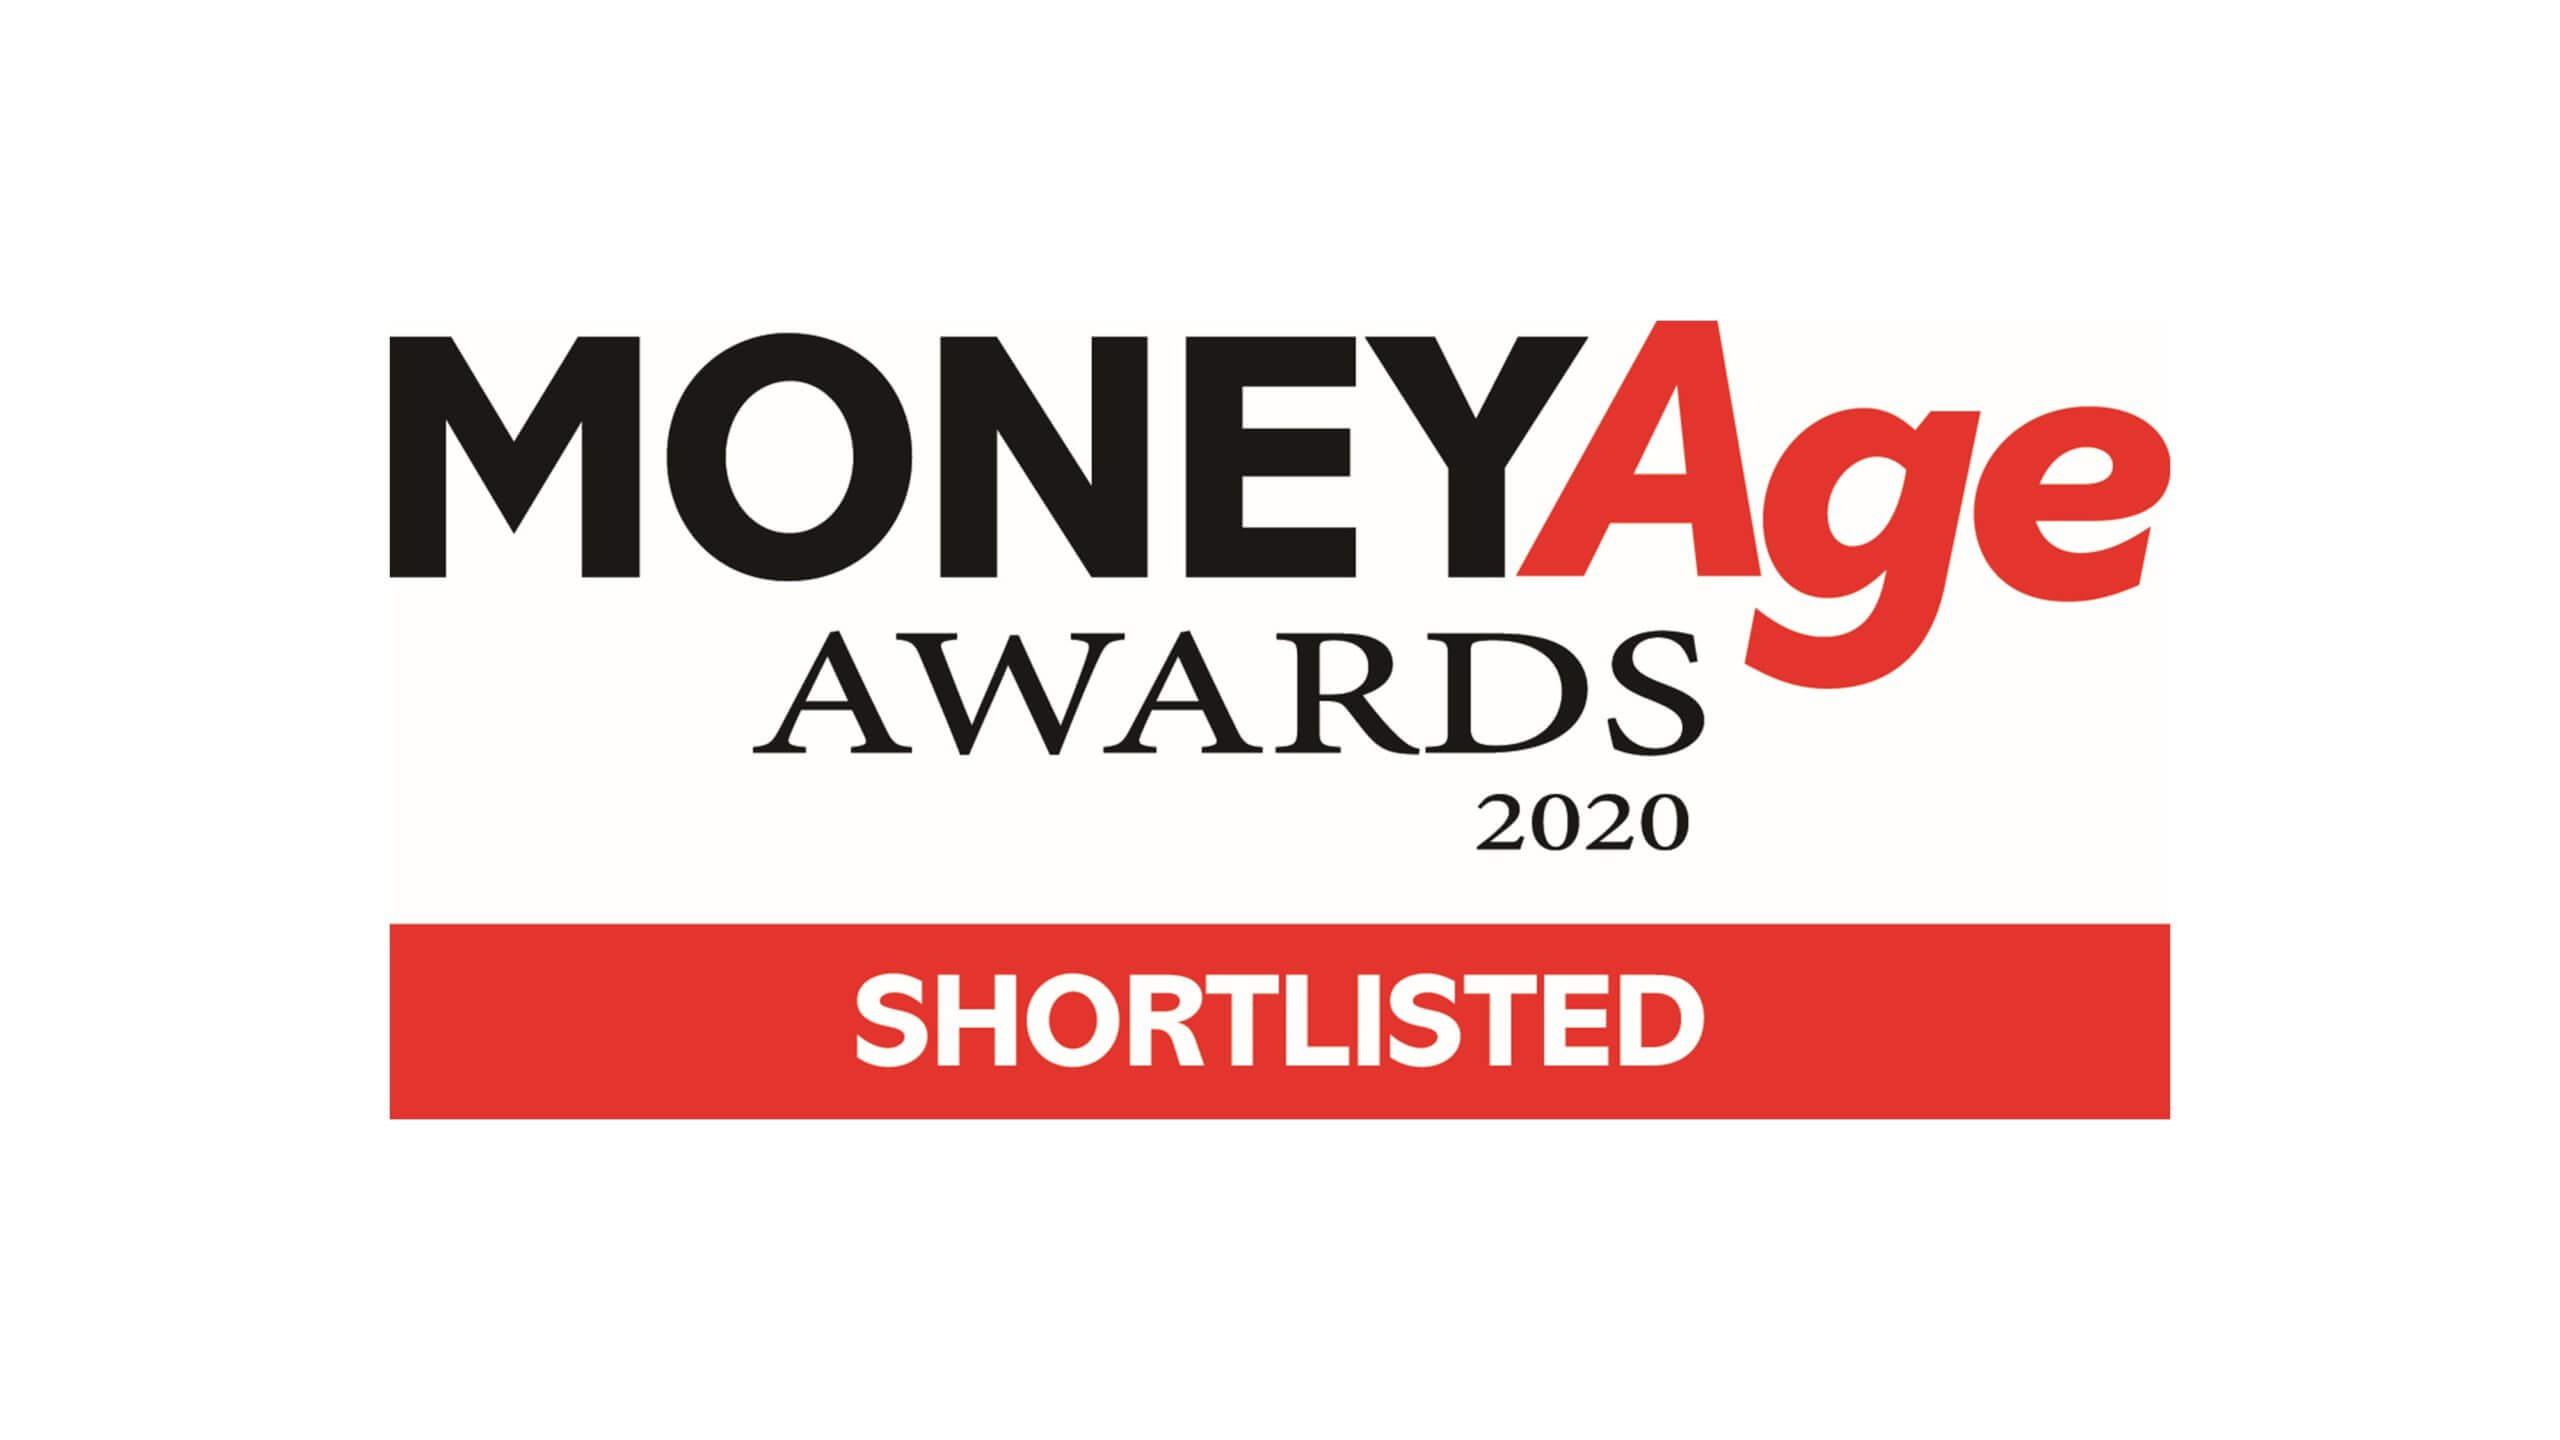 MoneyAge Awards 2020: Vizolution and BNP Paribas Chosen as Finalists!